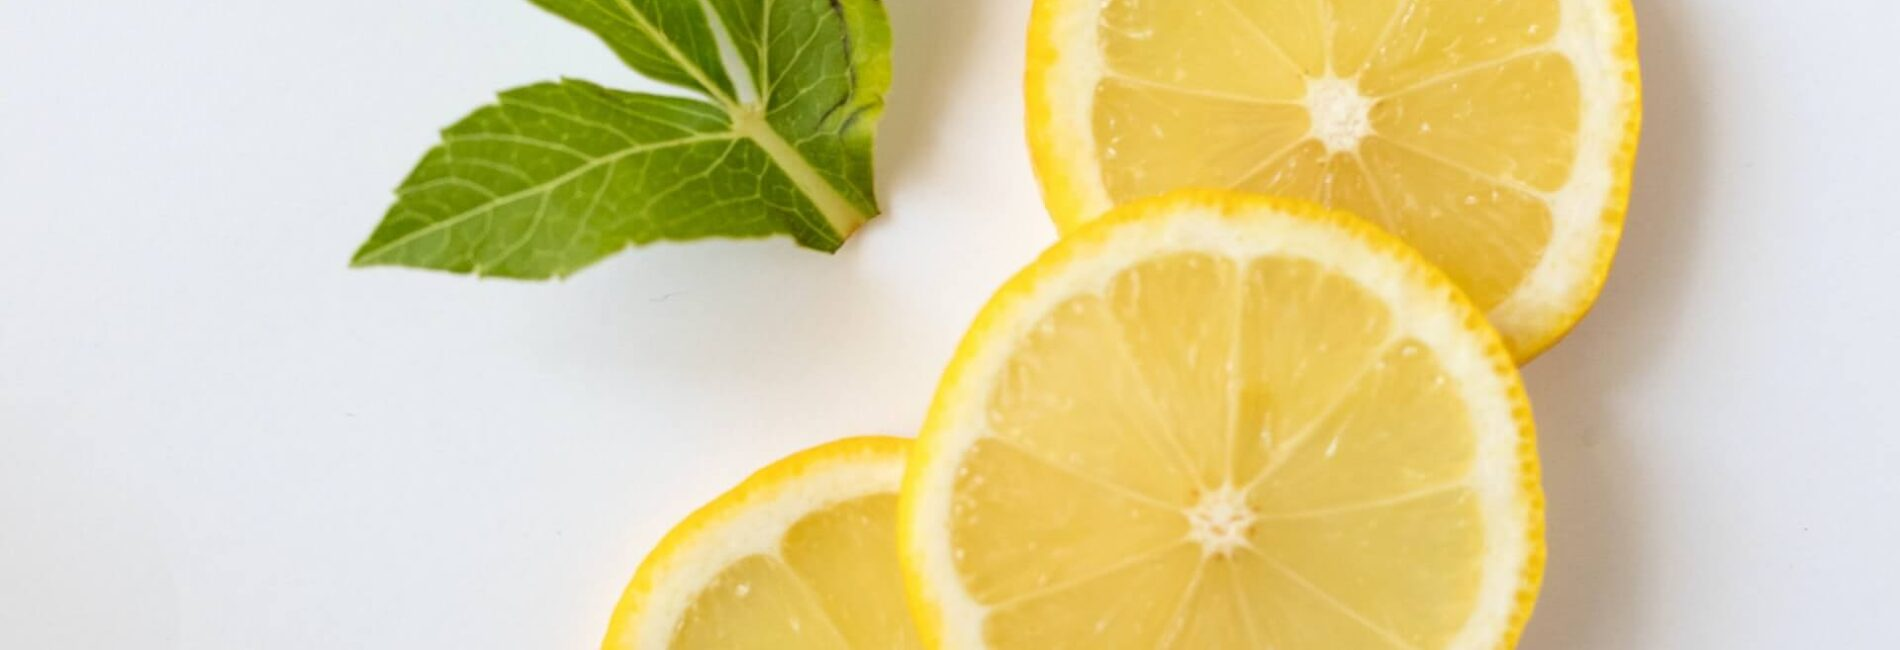 Lemon Bars – Great Taste with Lower Sugar & Fat